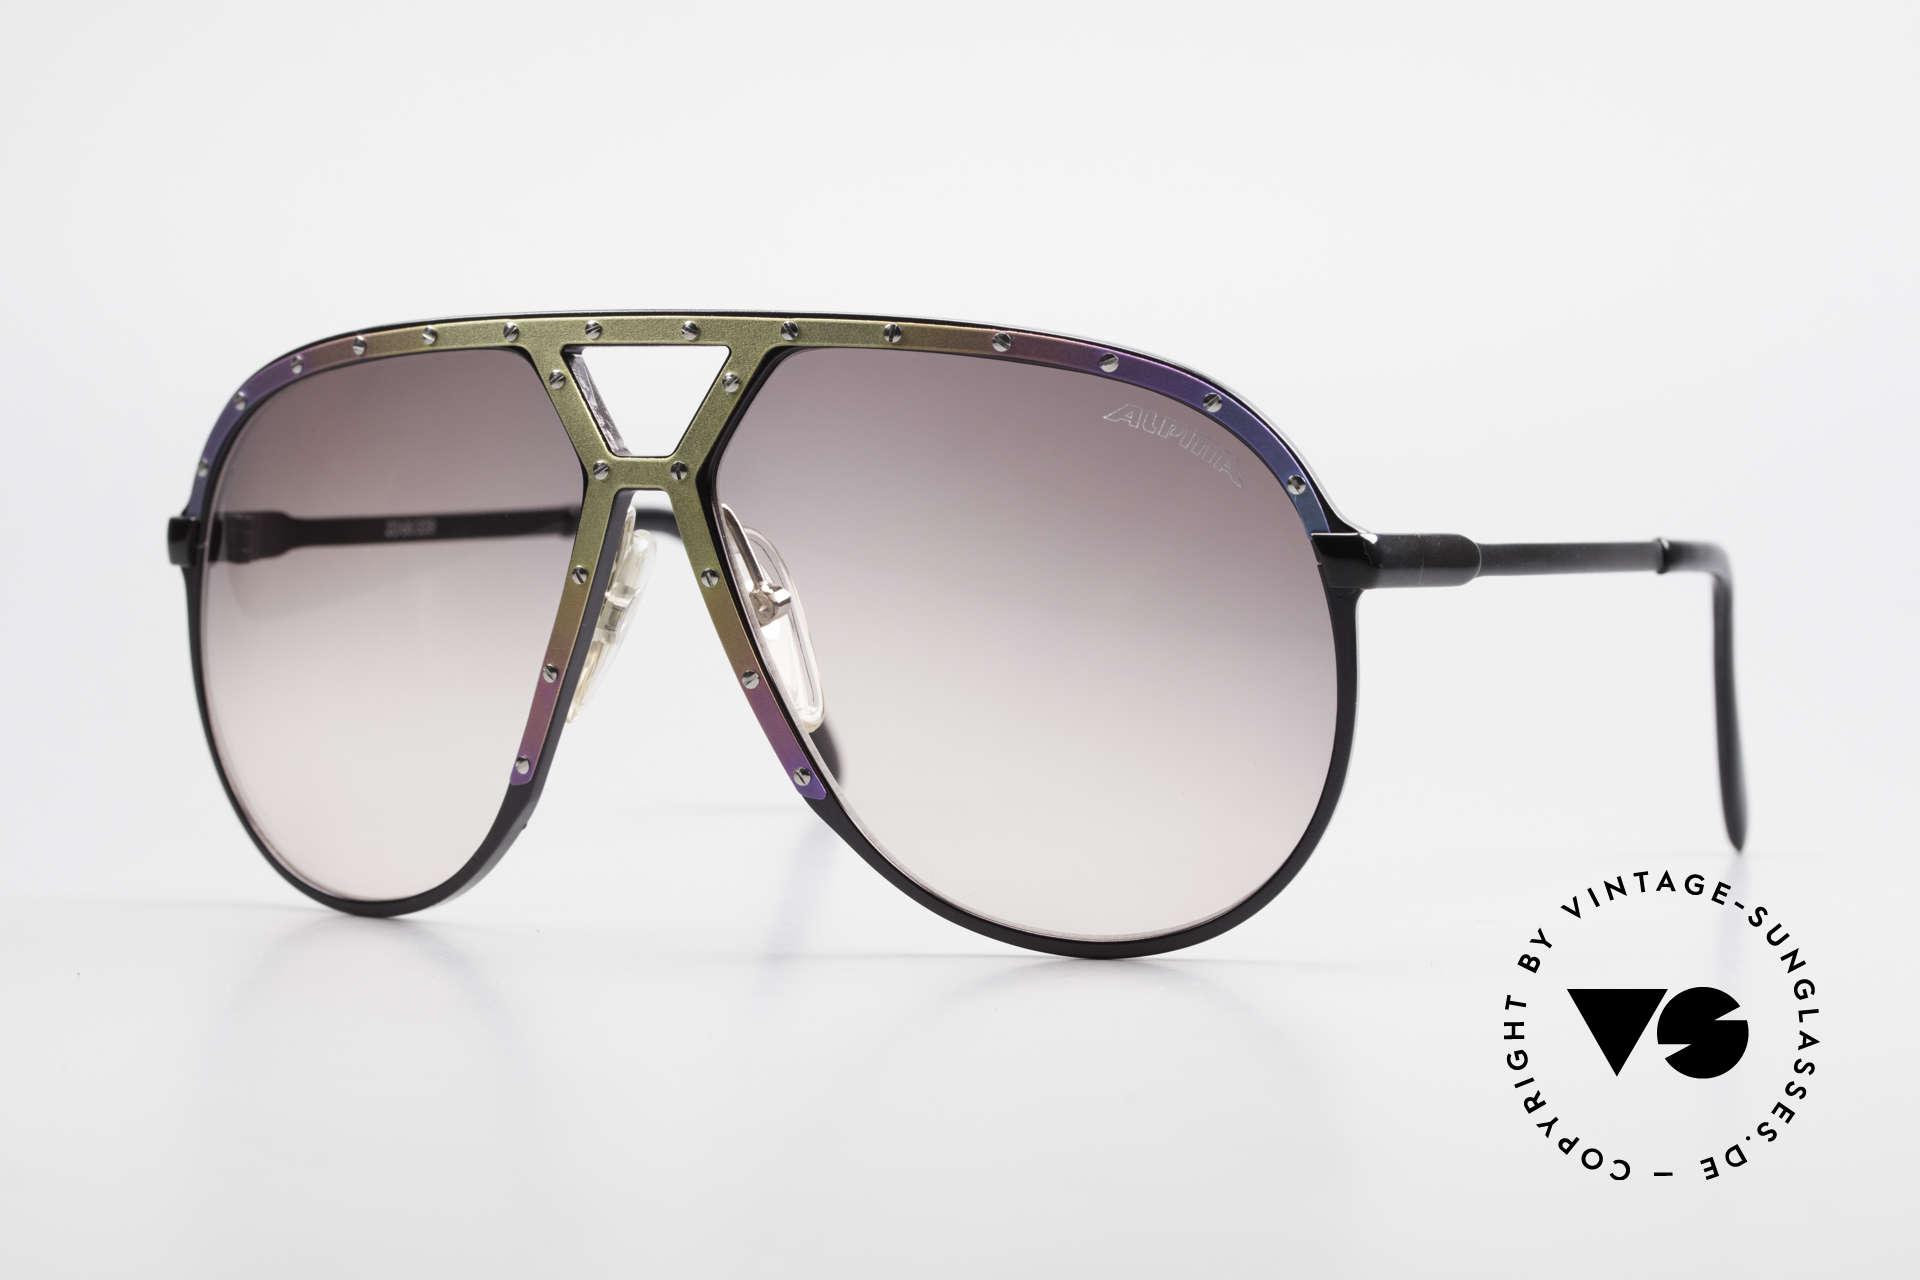 Alpina M1 Titanium 80er Limited Edition, vintage Alpina M1 Sonnenbrille, Titanium Edition, Passend für Herren